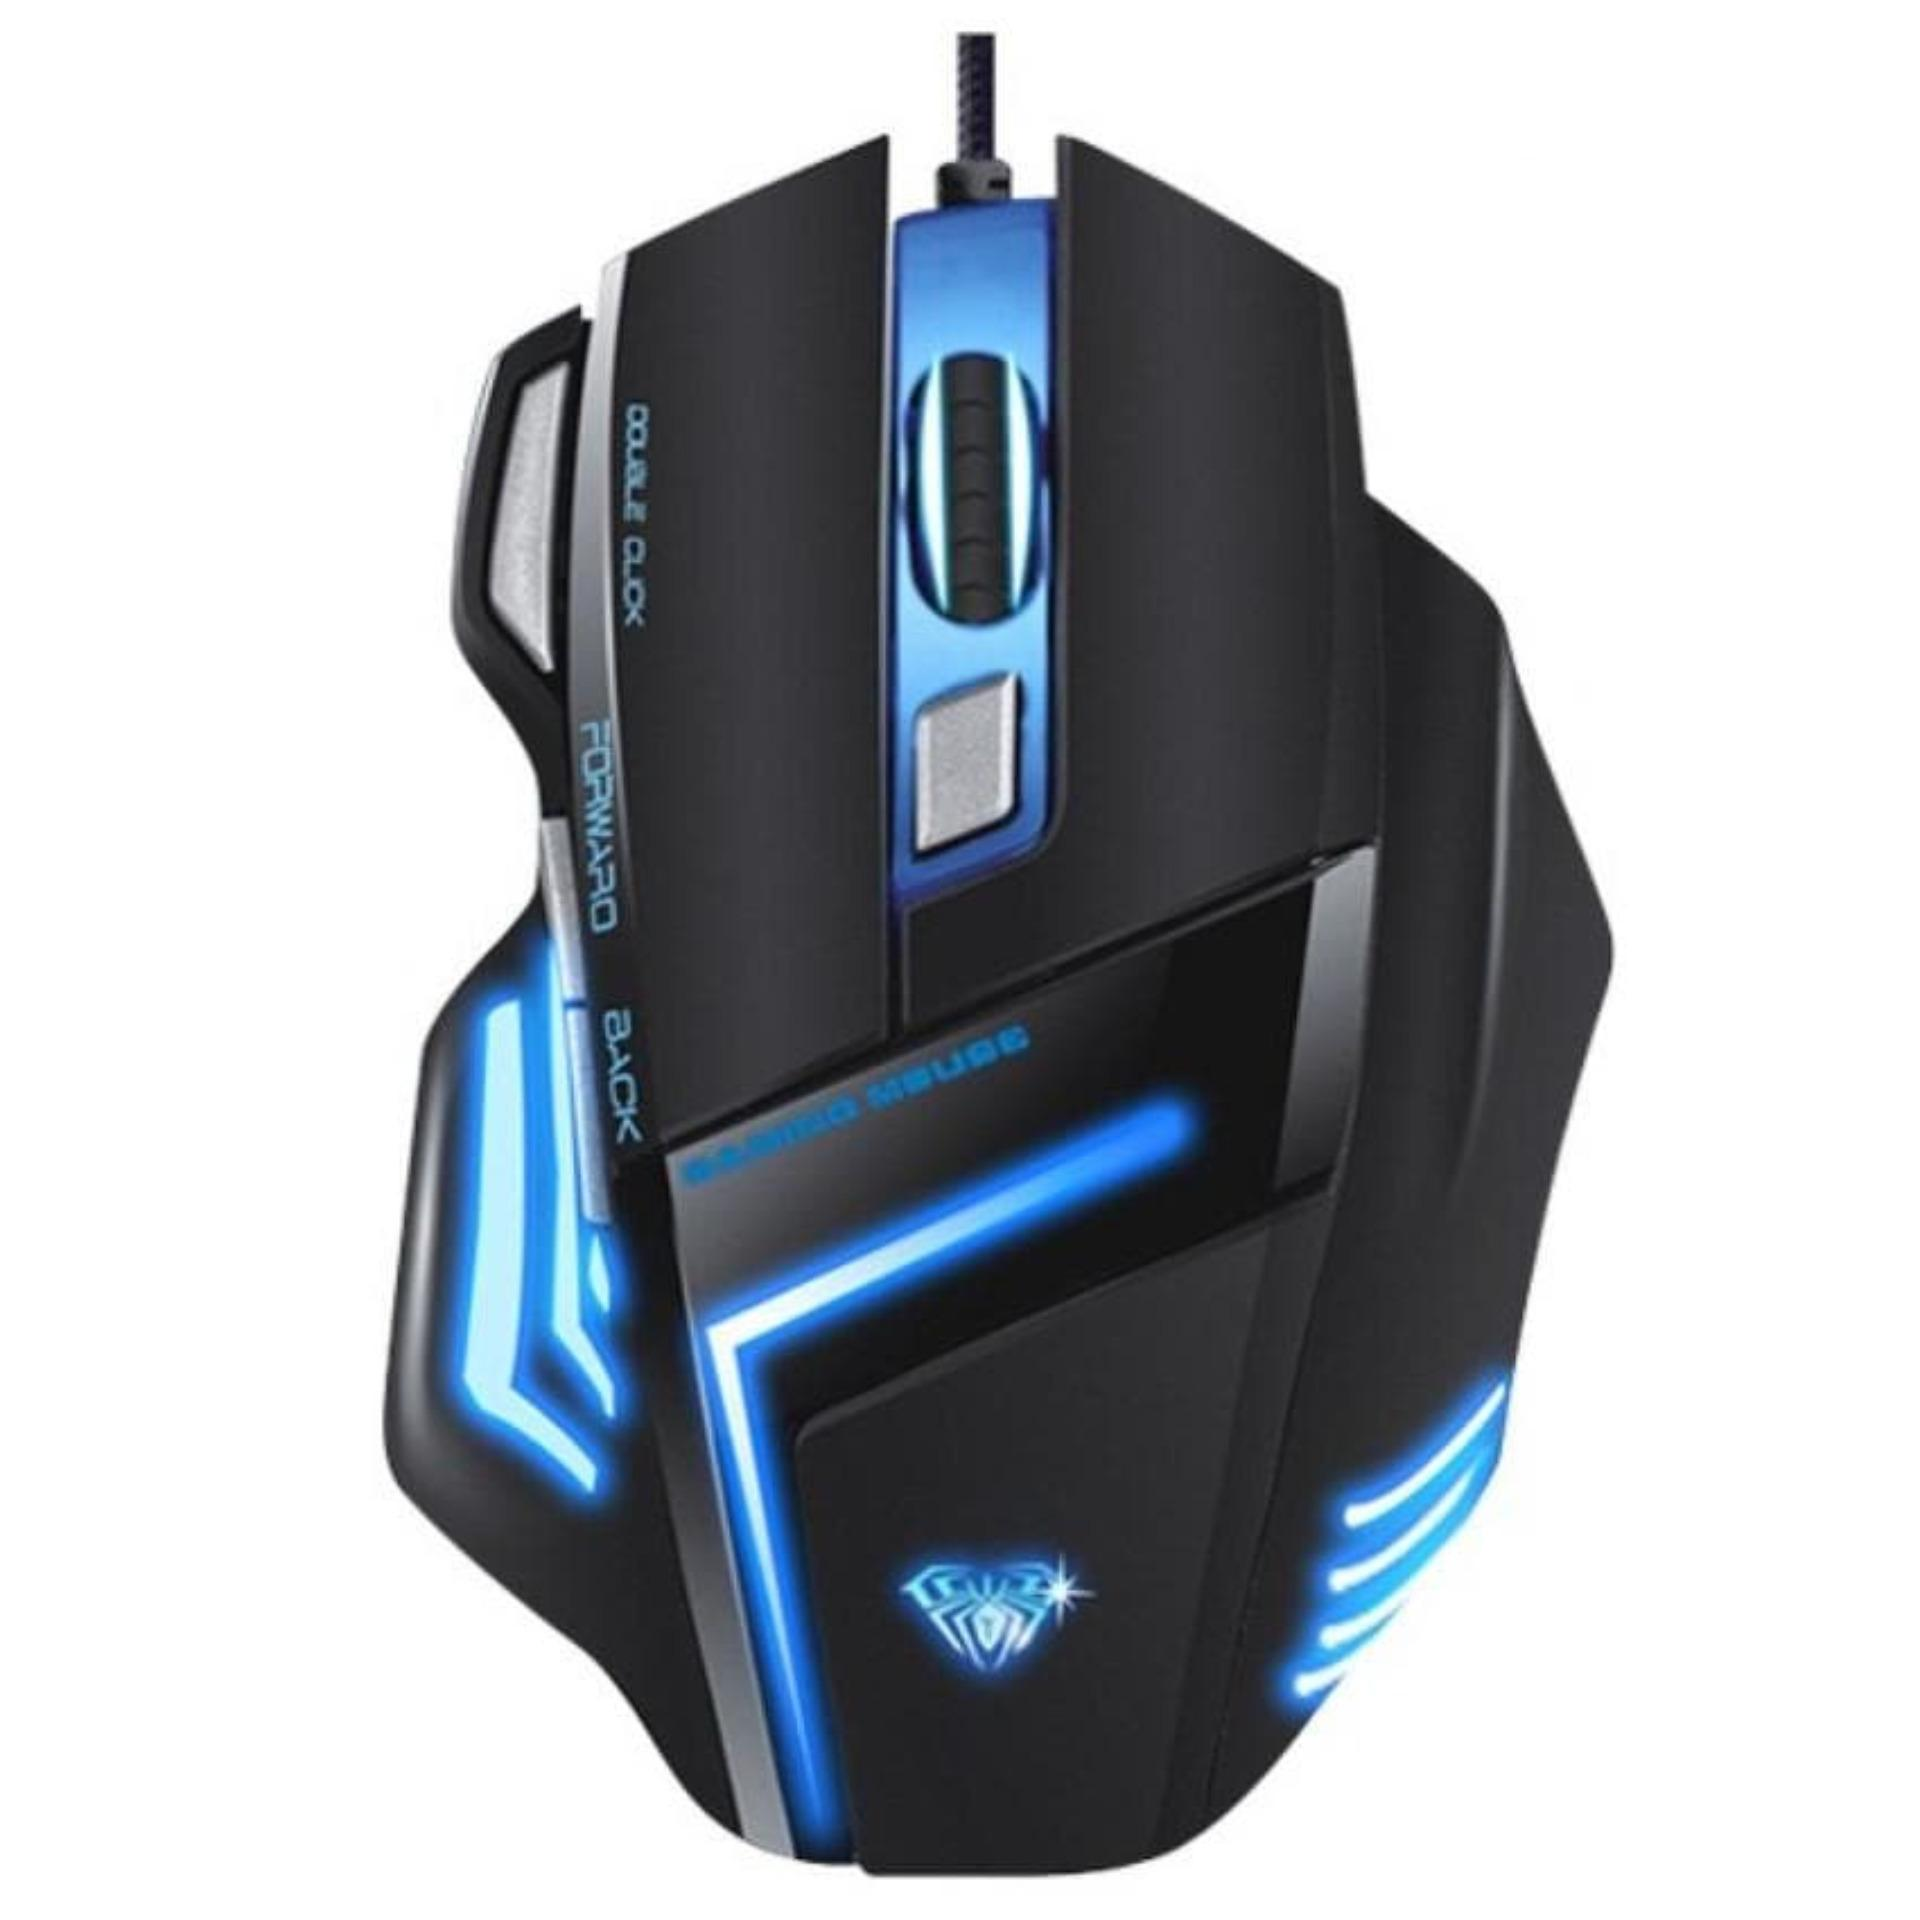 Logitech Keyboard Dan Mouse Mk120 Hitam Daftar Harga Penjualan Wireless Mk235 Combo Black Aula Gaming Ghost Shark 2000dpi Murah